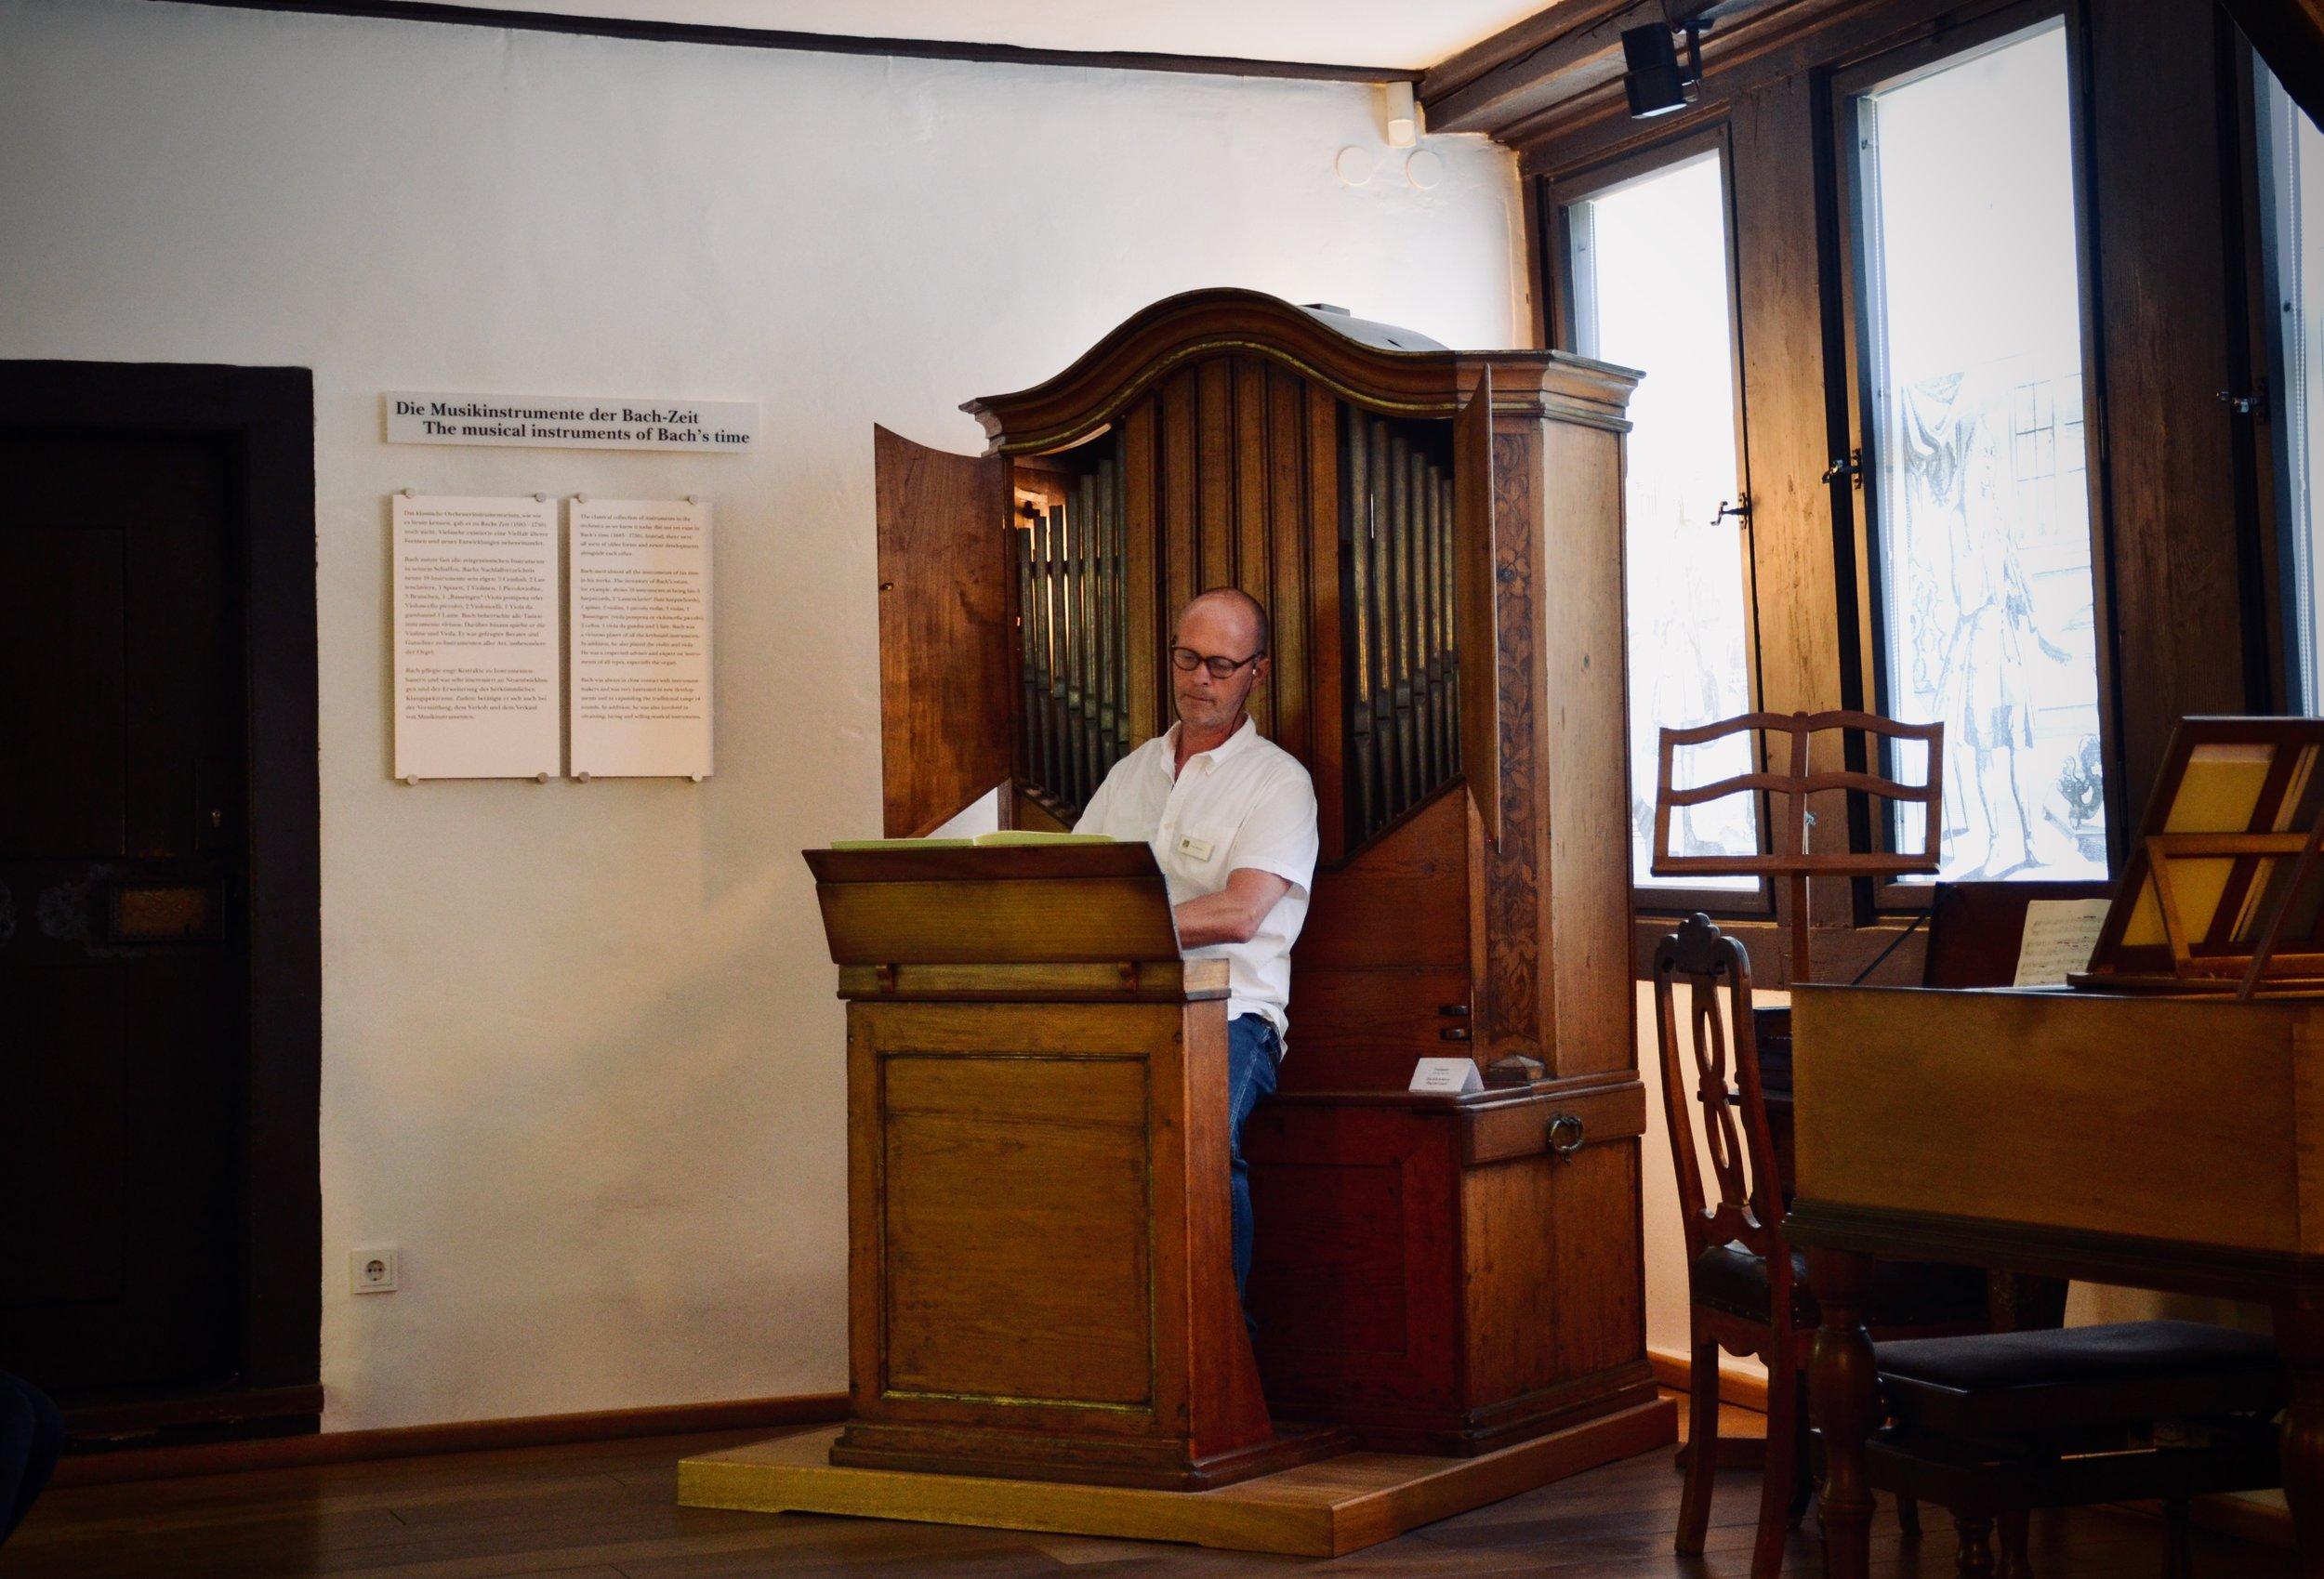 Curator Uwe Fischer of the Bachhaus Museum, Eisenach.